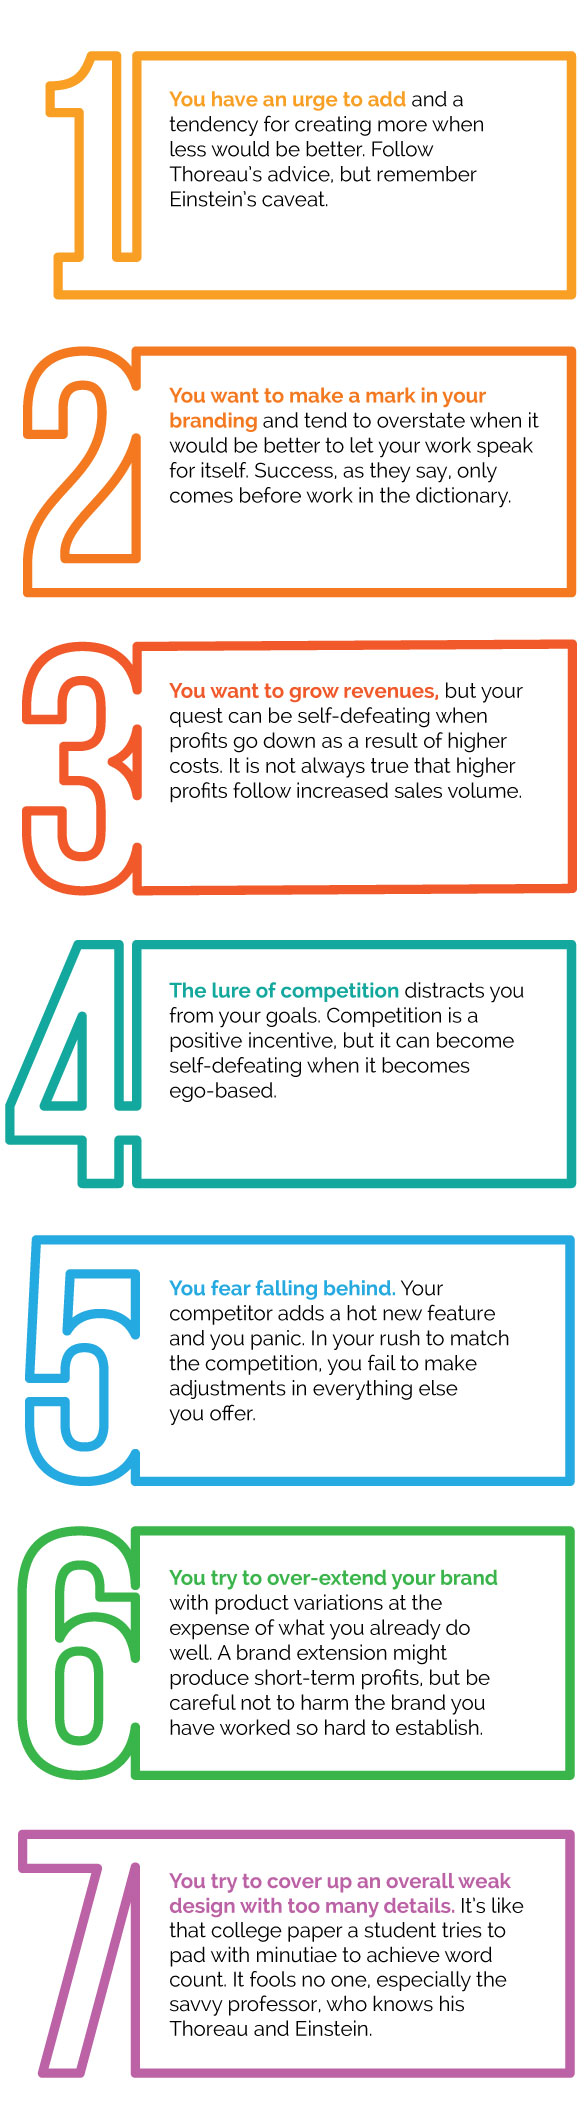 7 Ways to Sabatoge Marketing